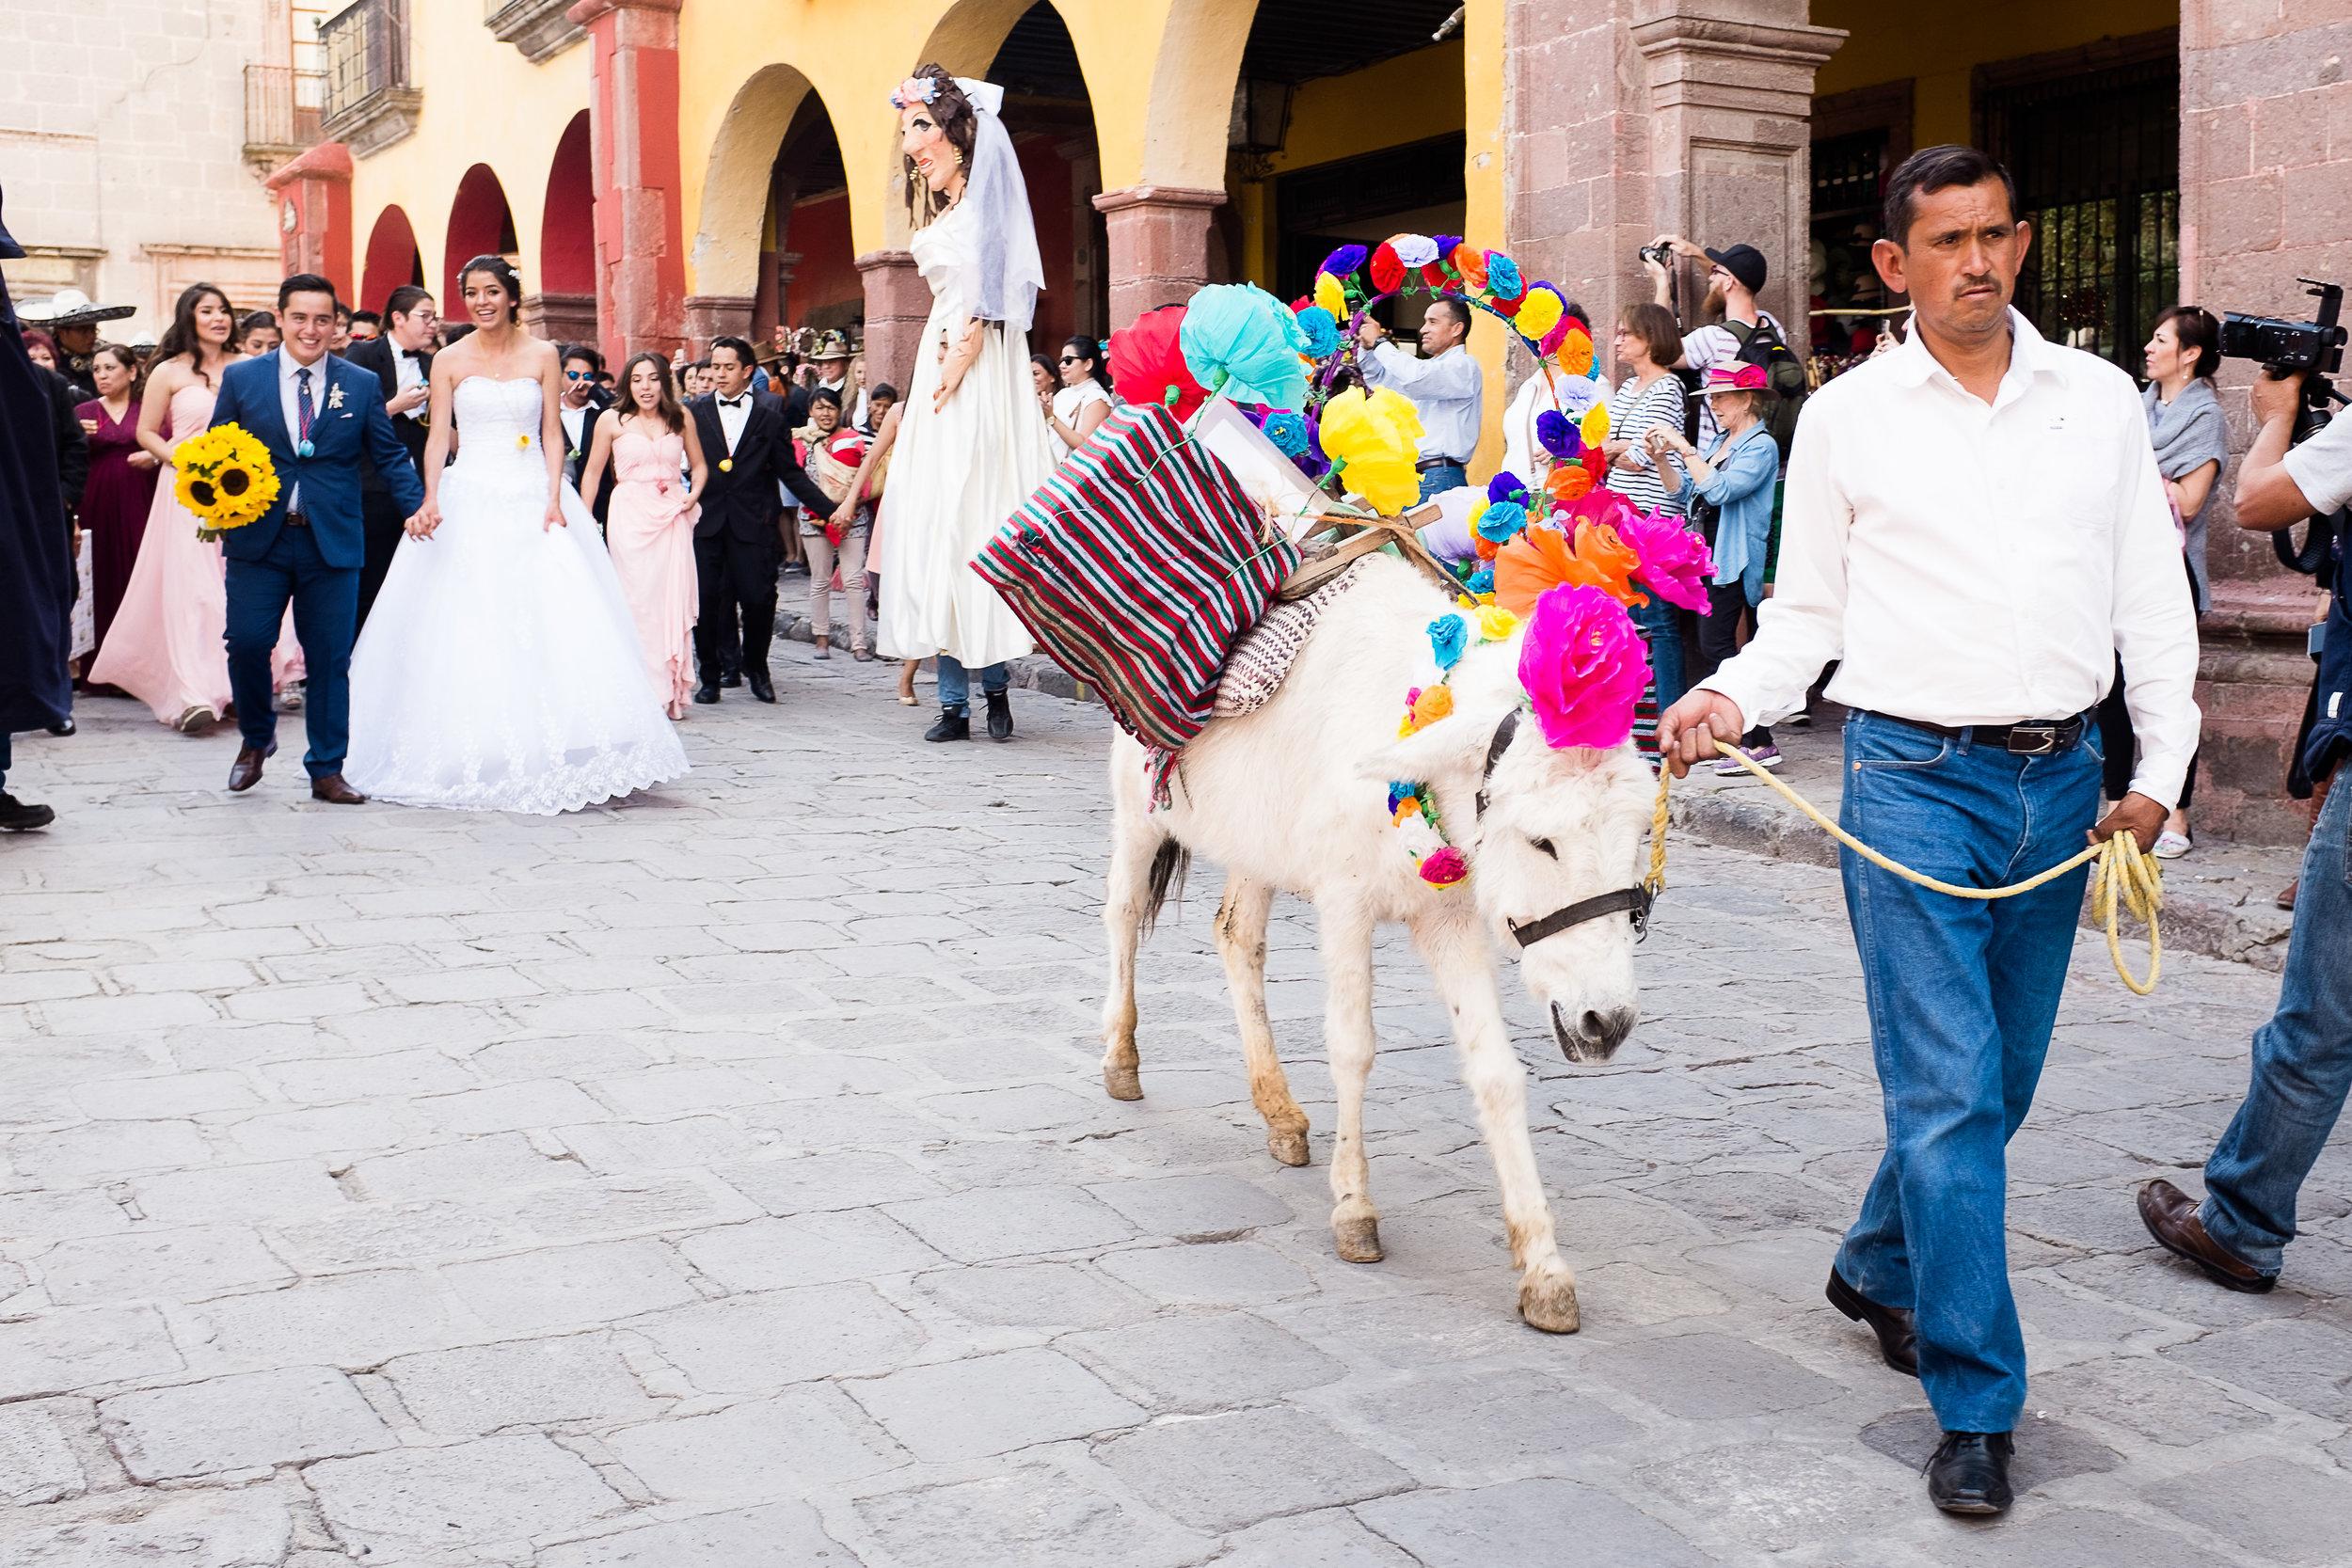 mexican-fine-art-wedding-traditions-donkey-mexico-karina-mora-prints-2.jpg